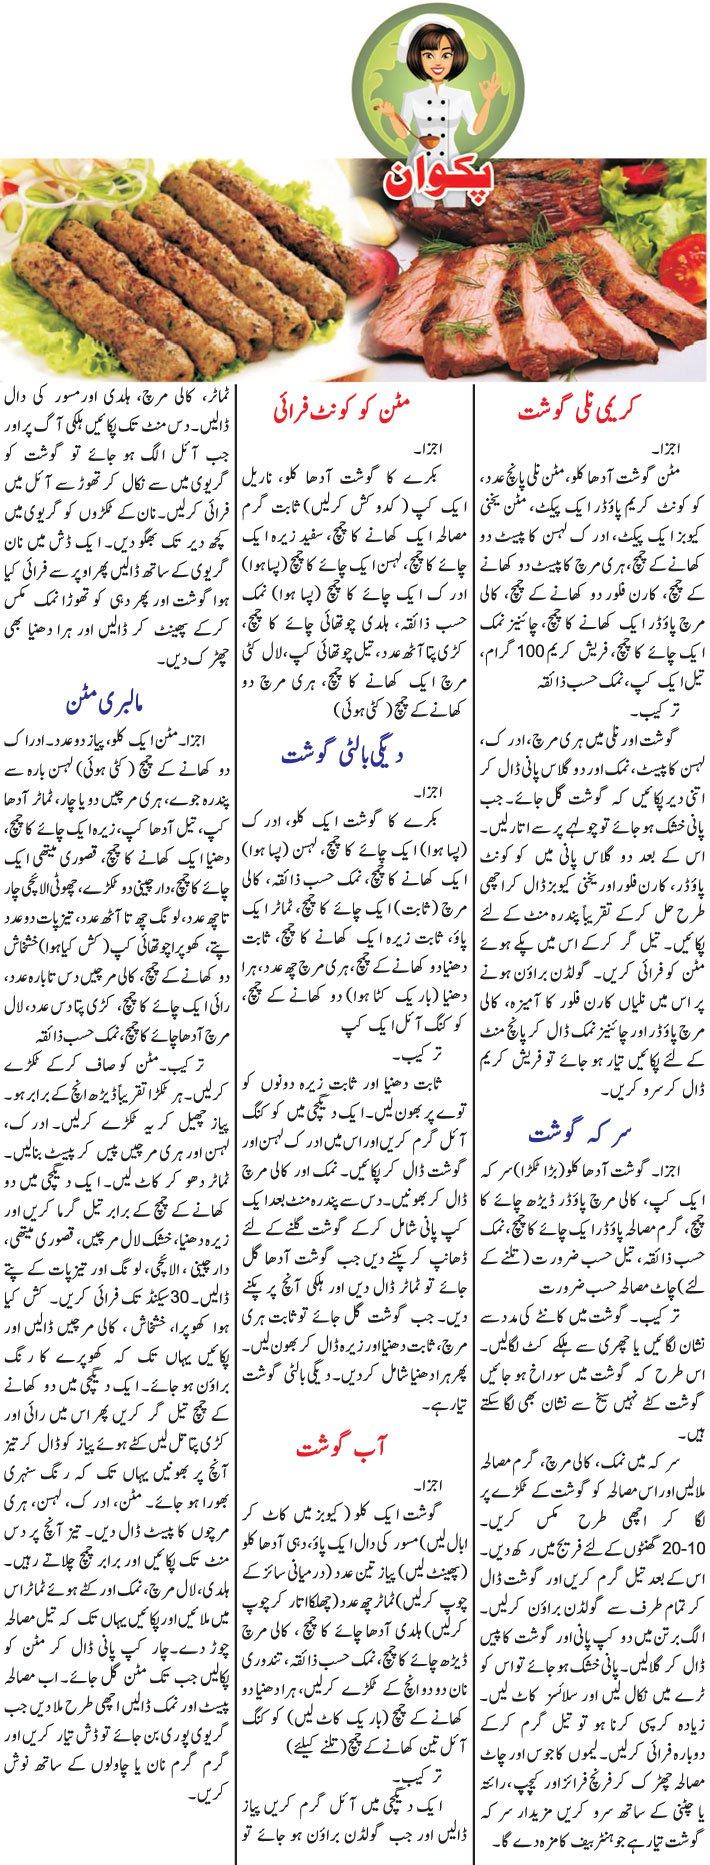 Delicious Meet & Beef Recipes For Eid-Ul-Adha in Urdu